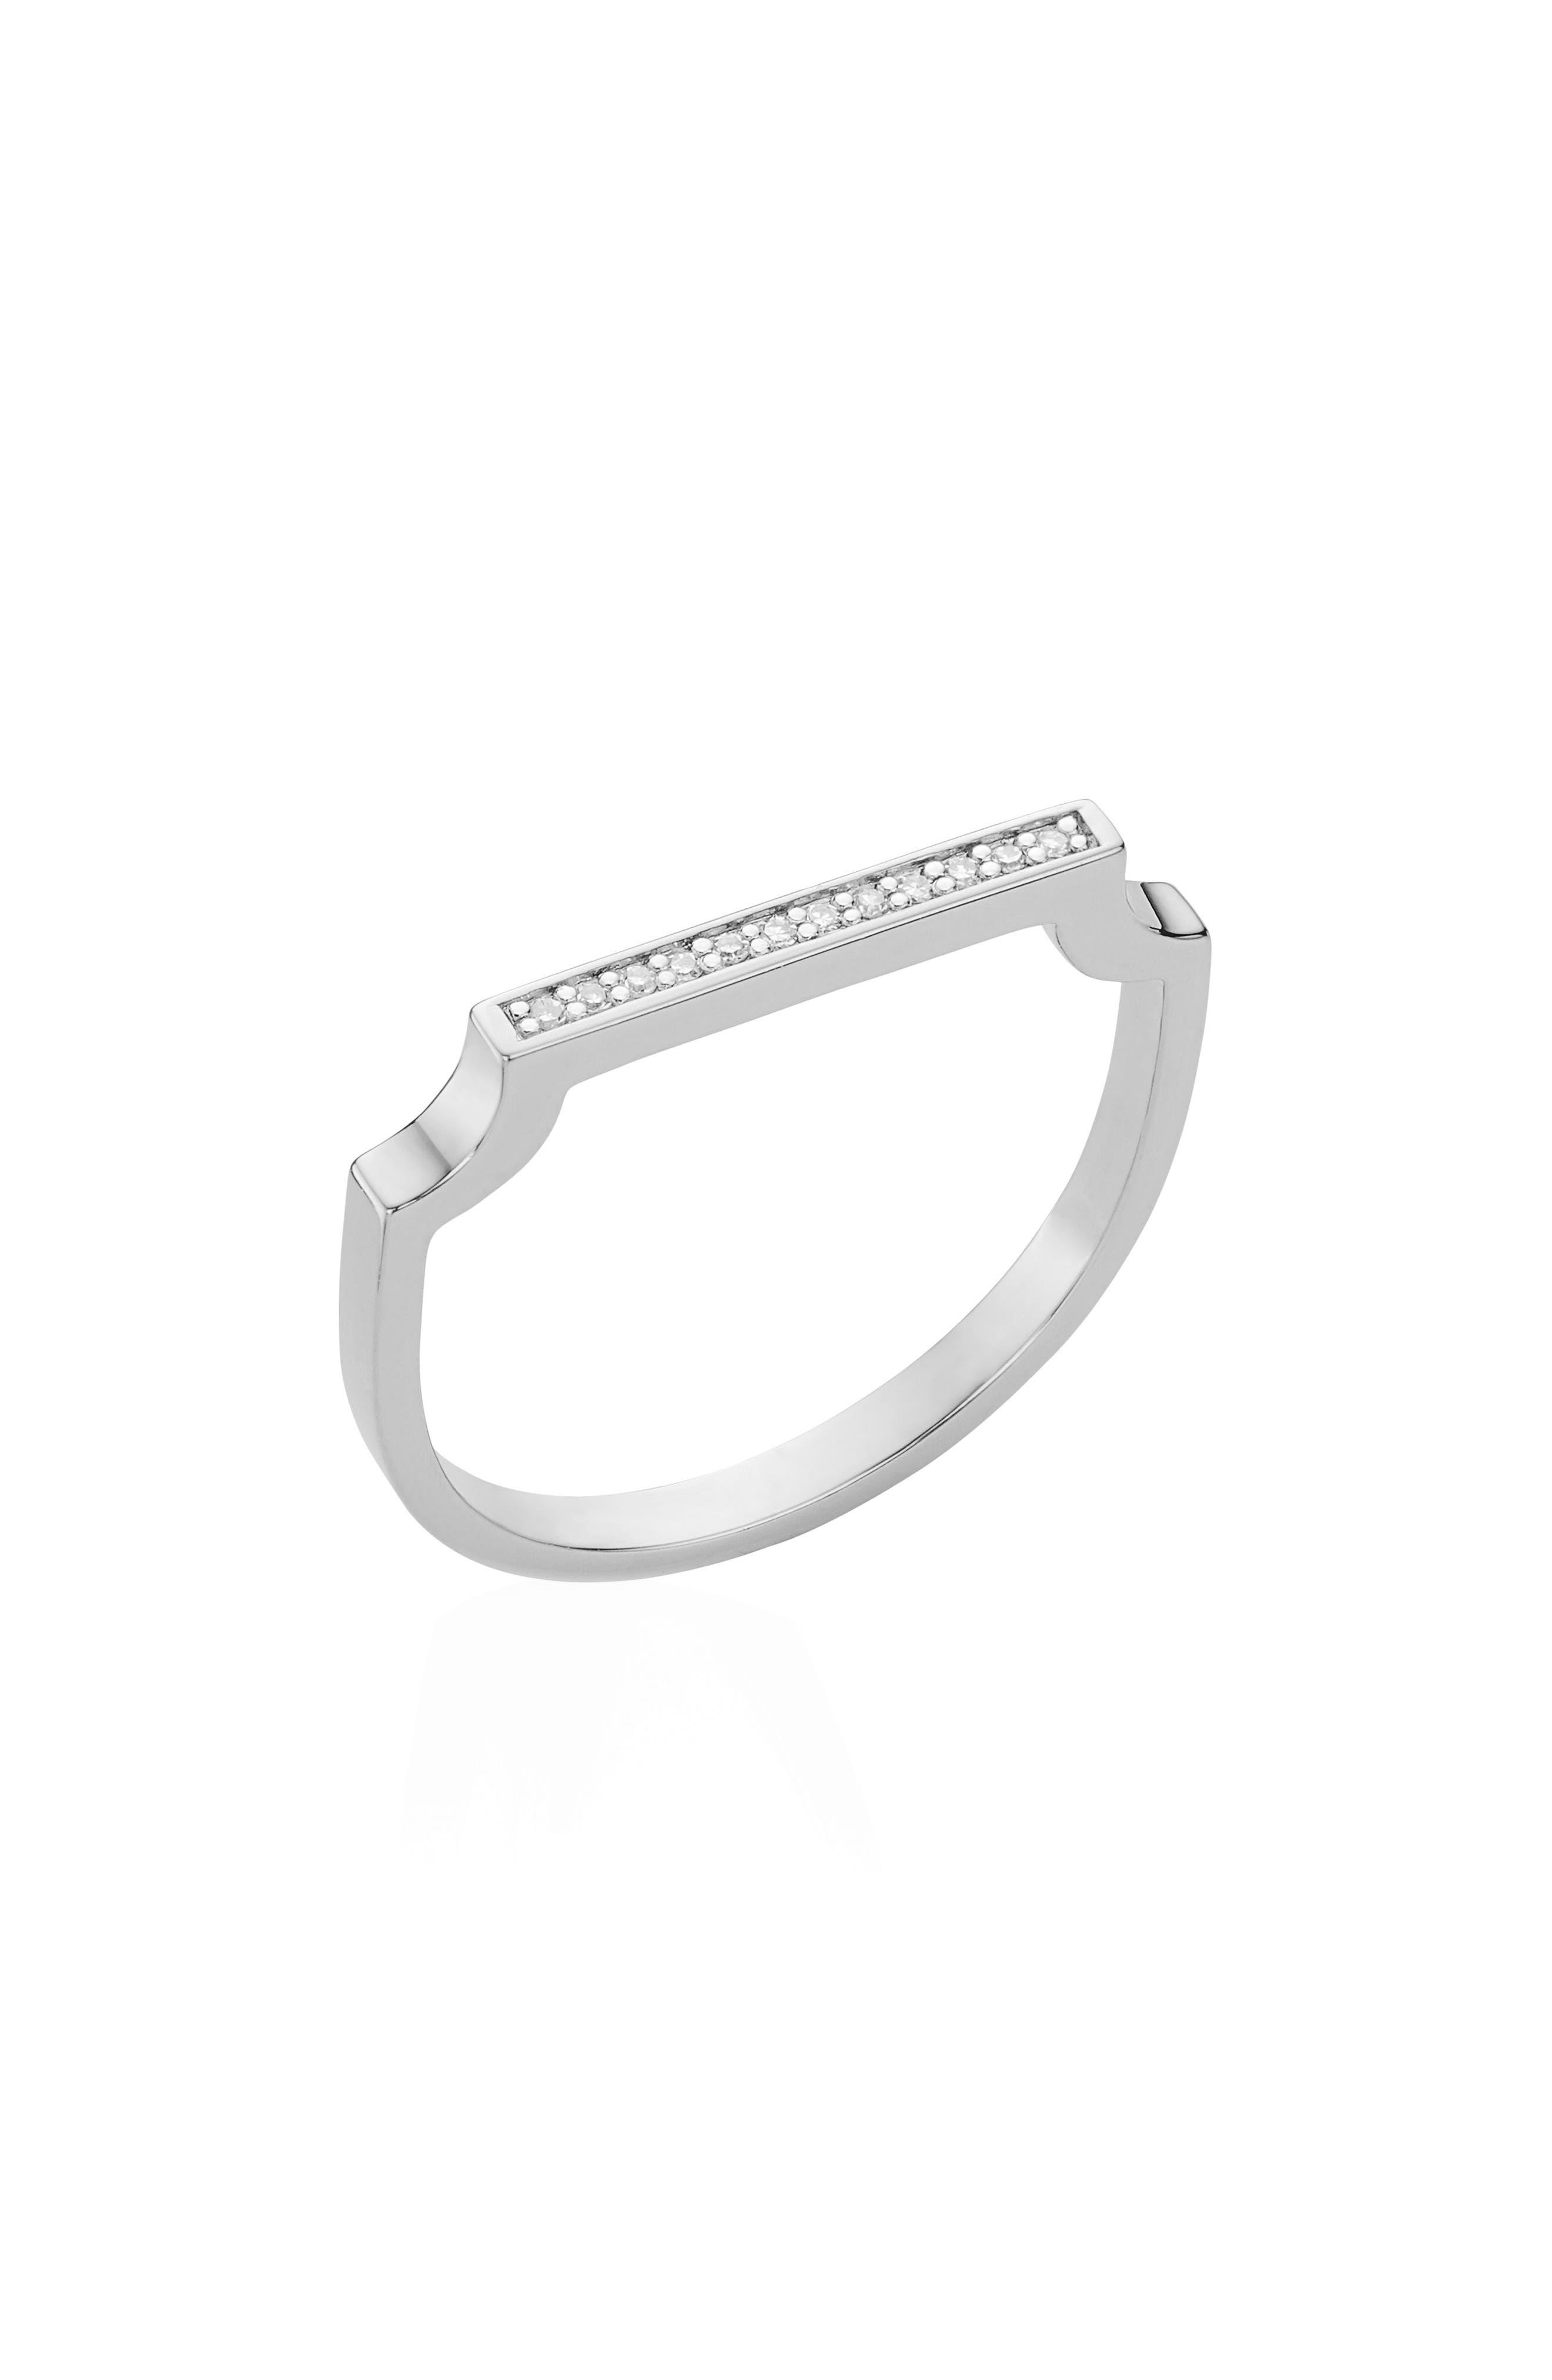 MONICA VINADER, Signature Thin Diamond Ring, Main thumbnail 1, color, SILVER/ DIAMOND